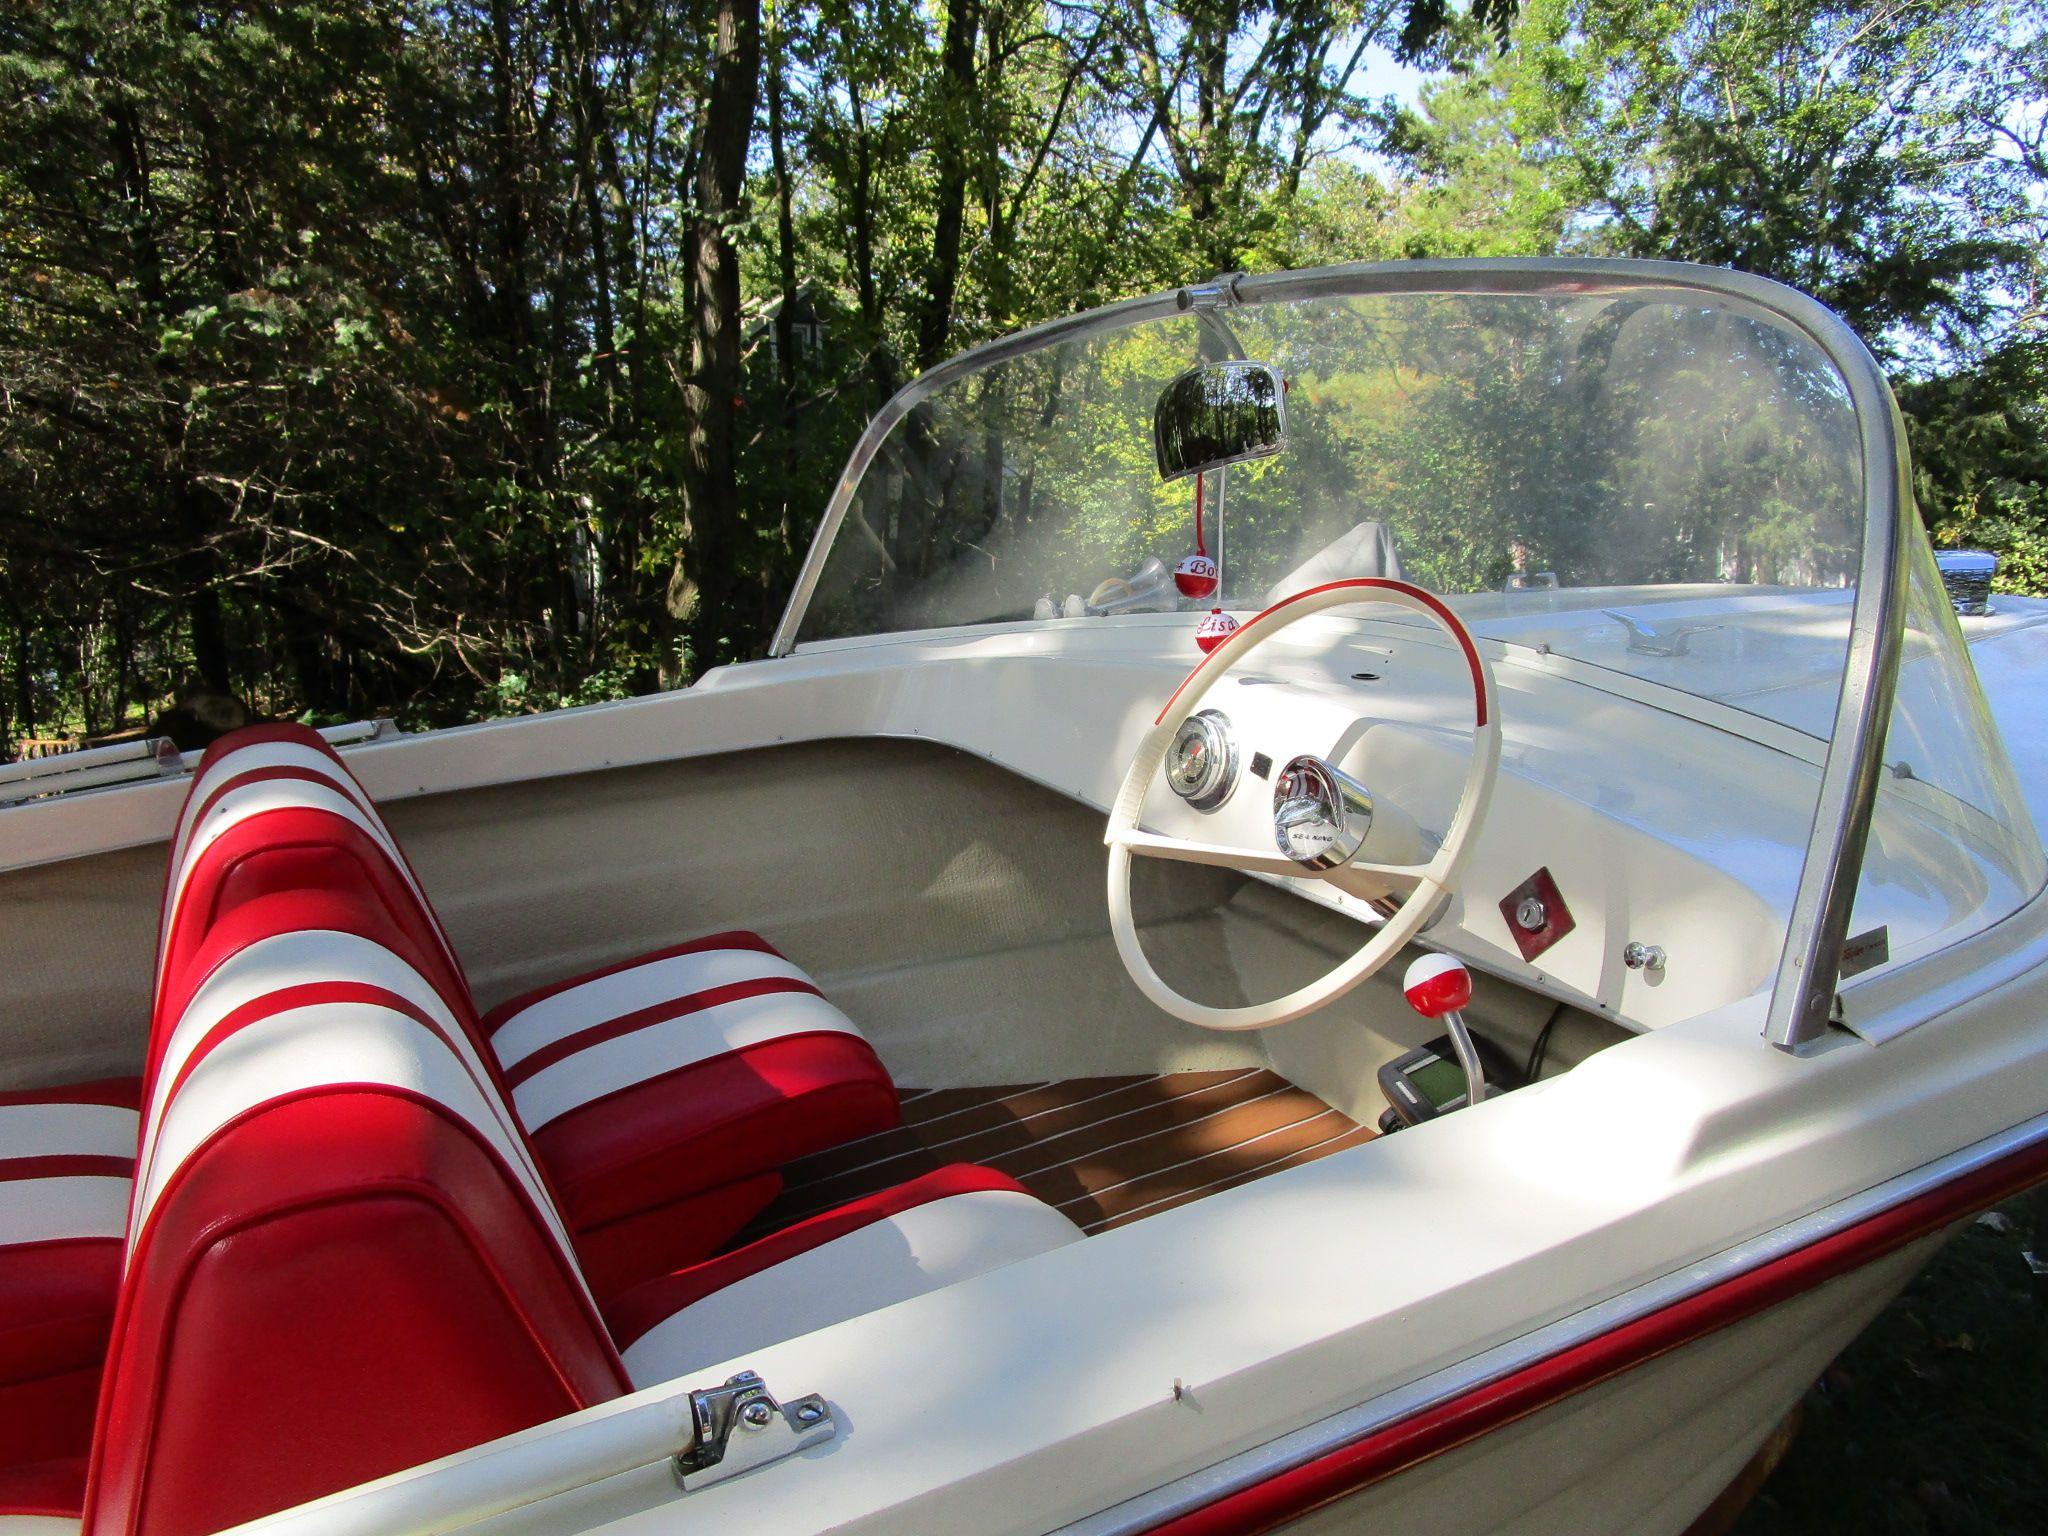 My Bobbette 1964 Fiberglass Sea King Runabout Boat Runabout Boat Vintage Boats Classic Boats